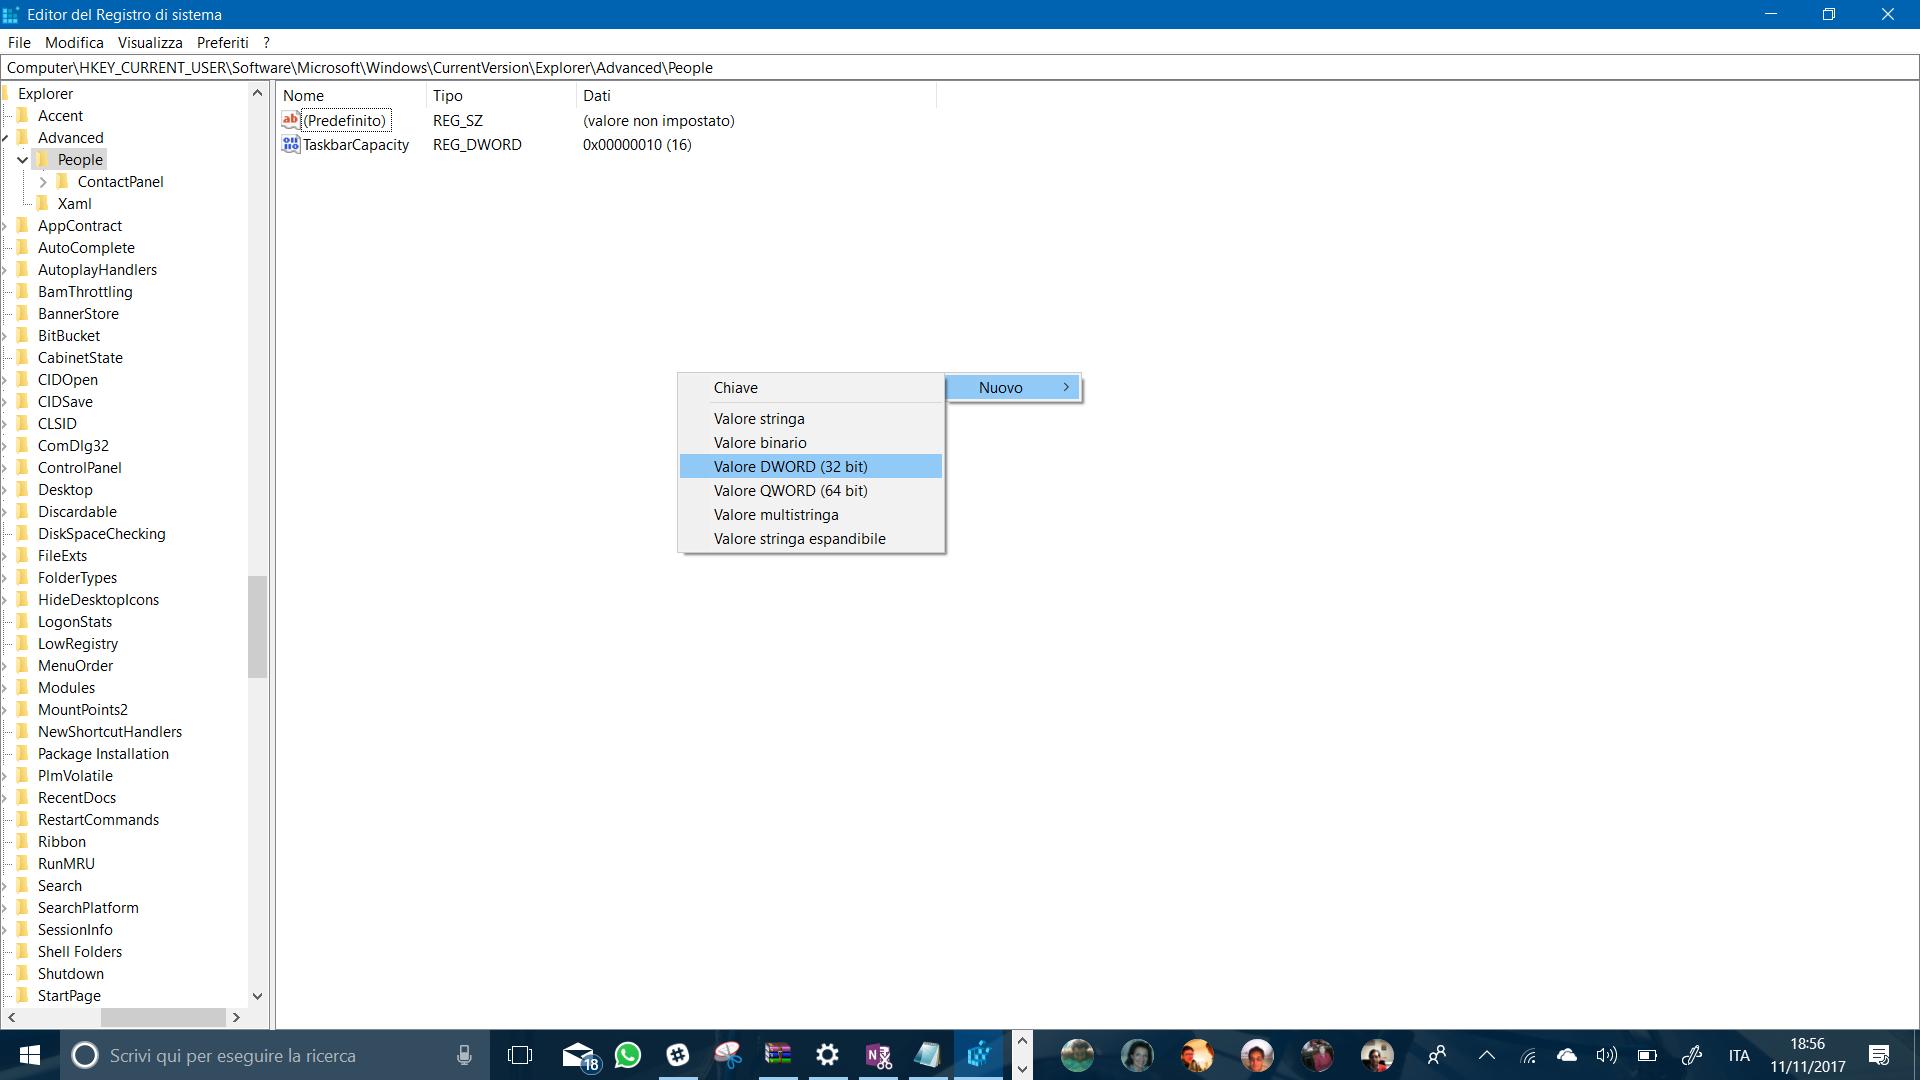 regDWORD taskbar capacity